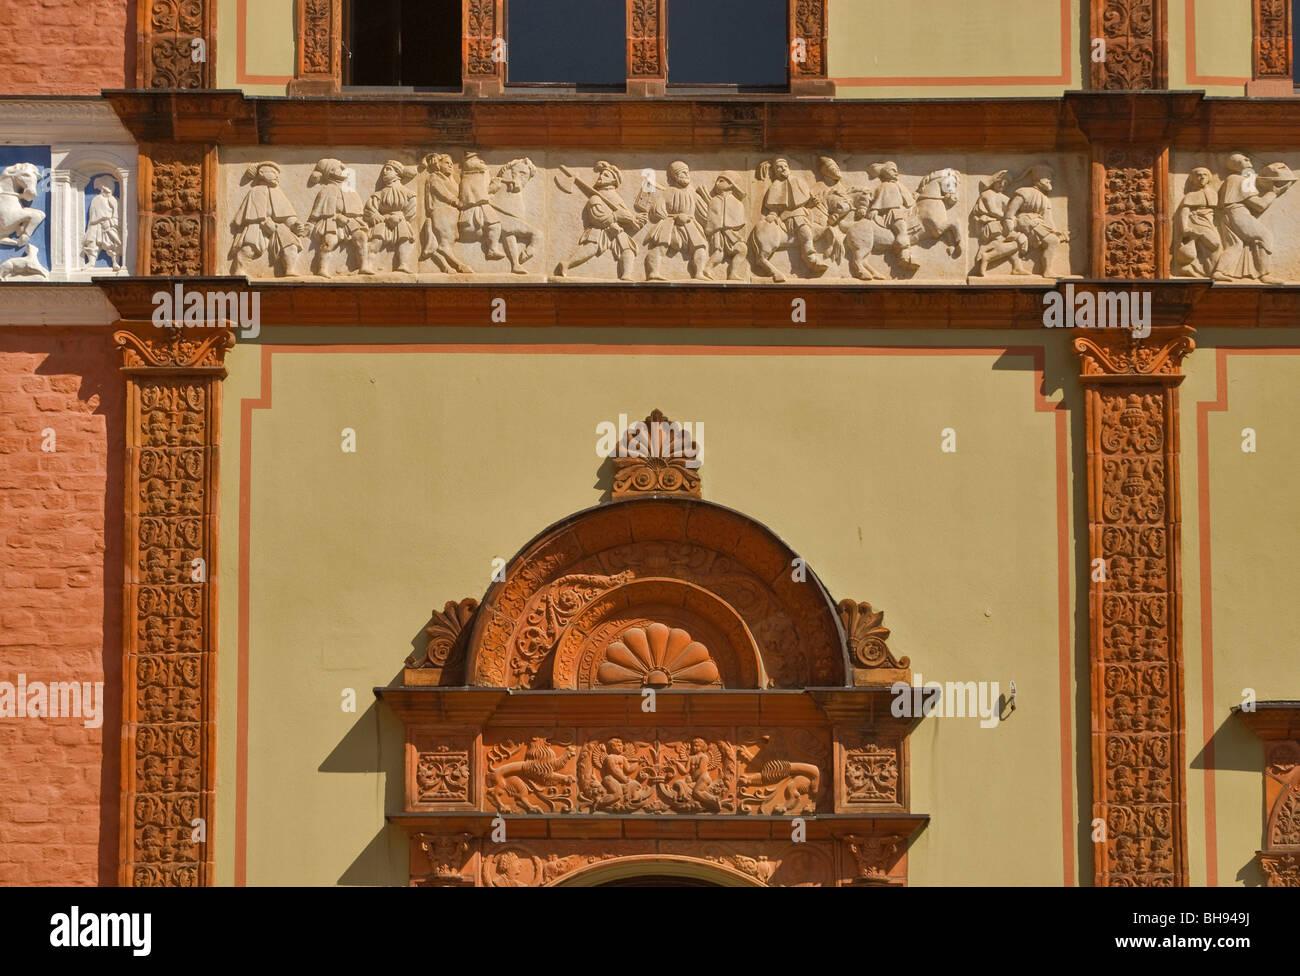 Low reliefs at Fürstenhof castle in Wismar in Mecklenburg-West Pomerania, Germany - Stock Image